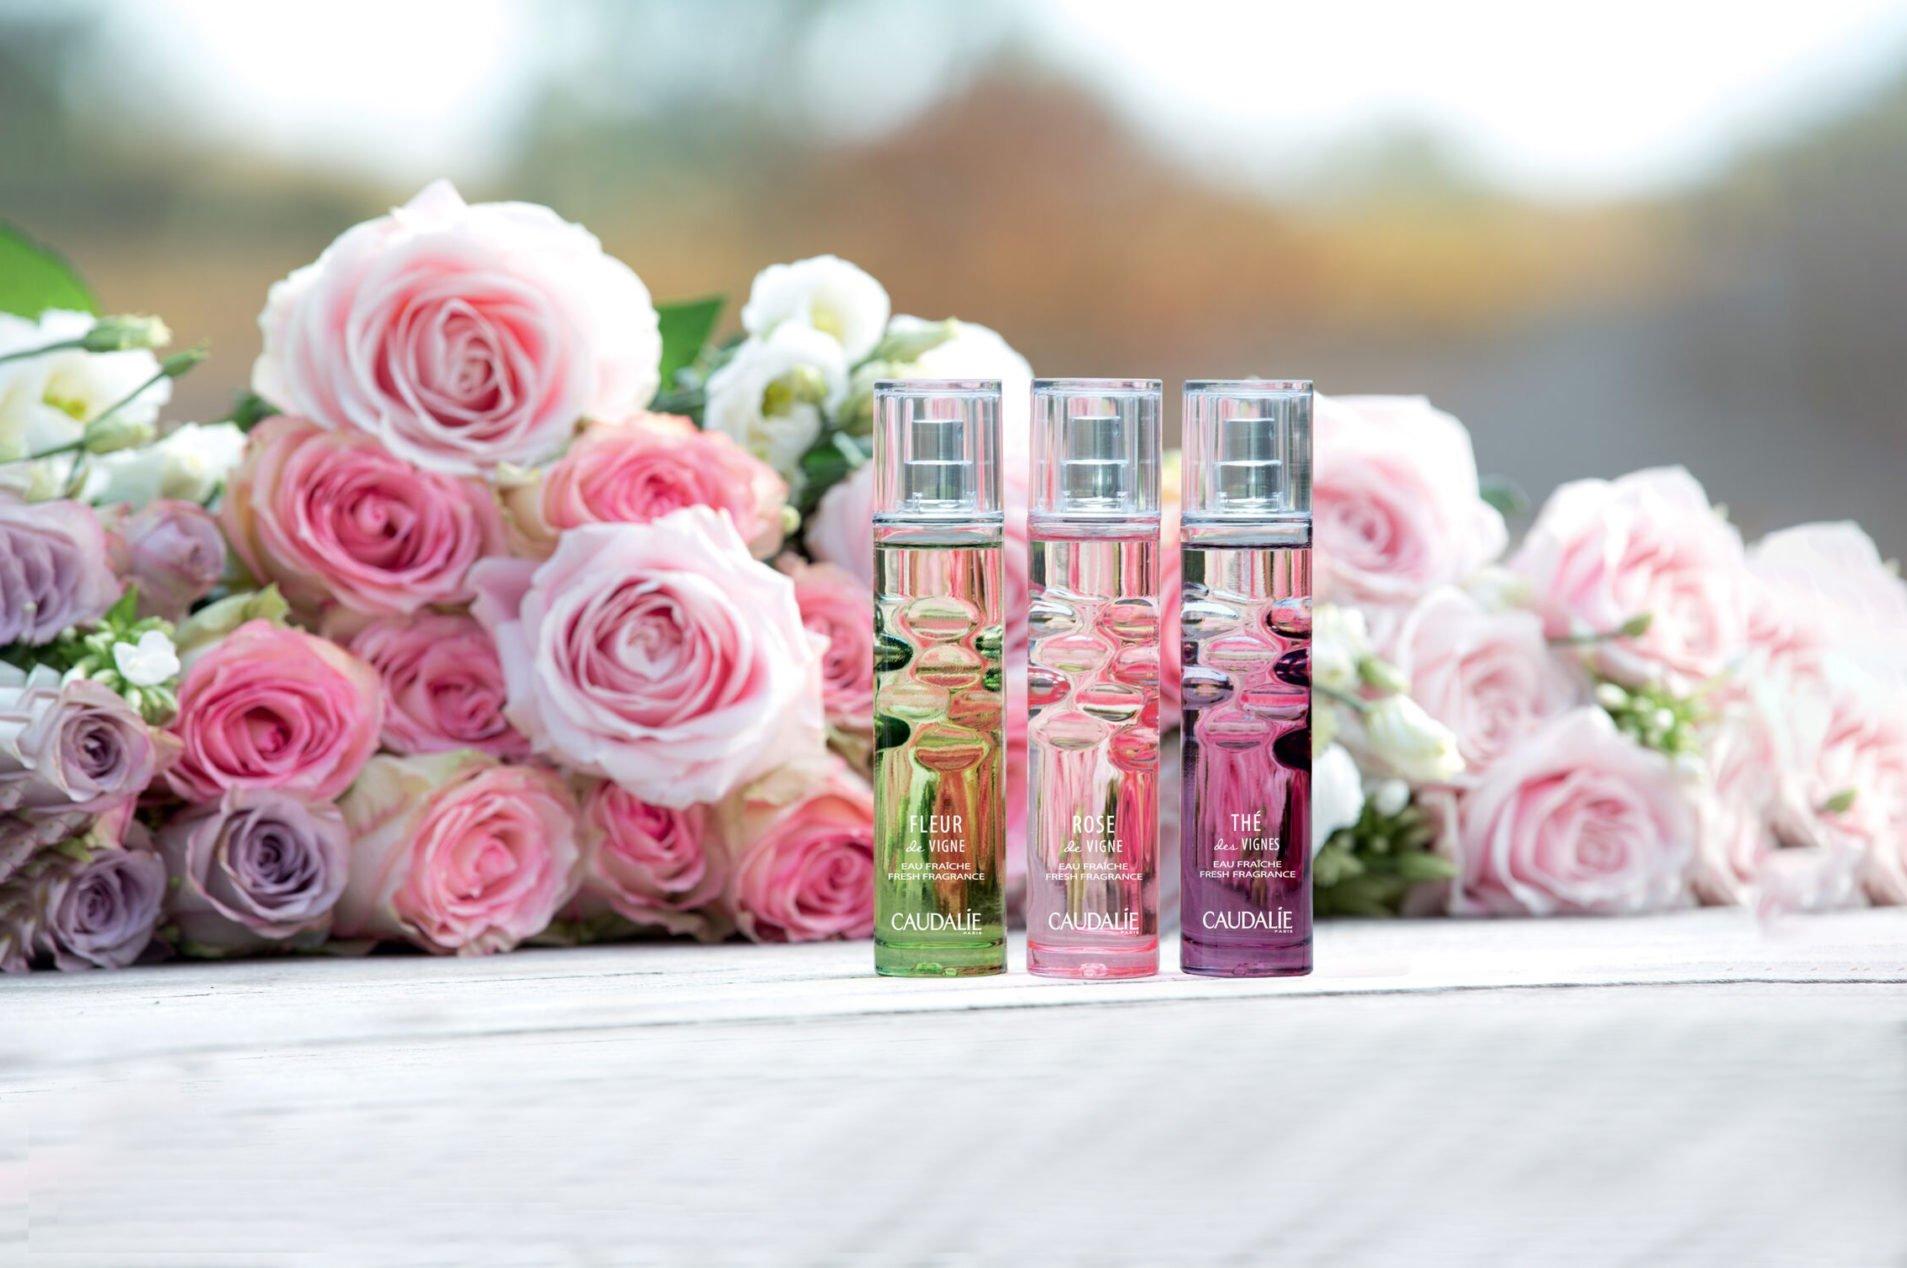 Caudalie 'Fleur de Vigne' Rose Fresh Fragrance at Frontlinestyle